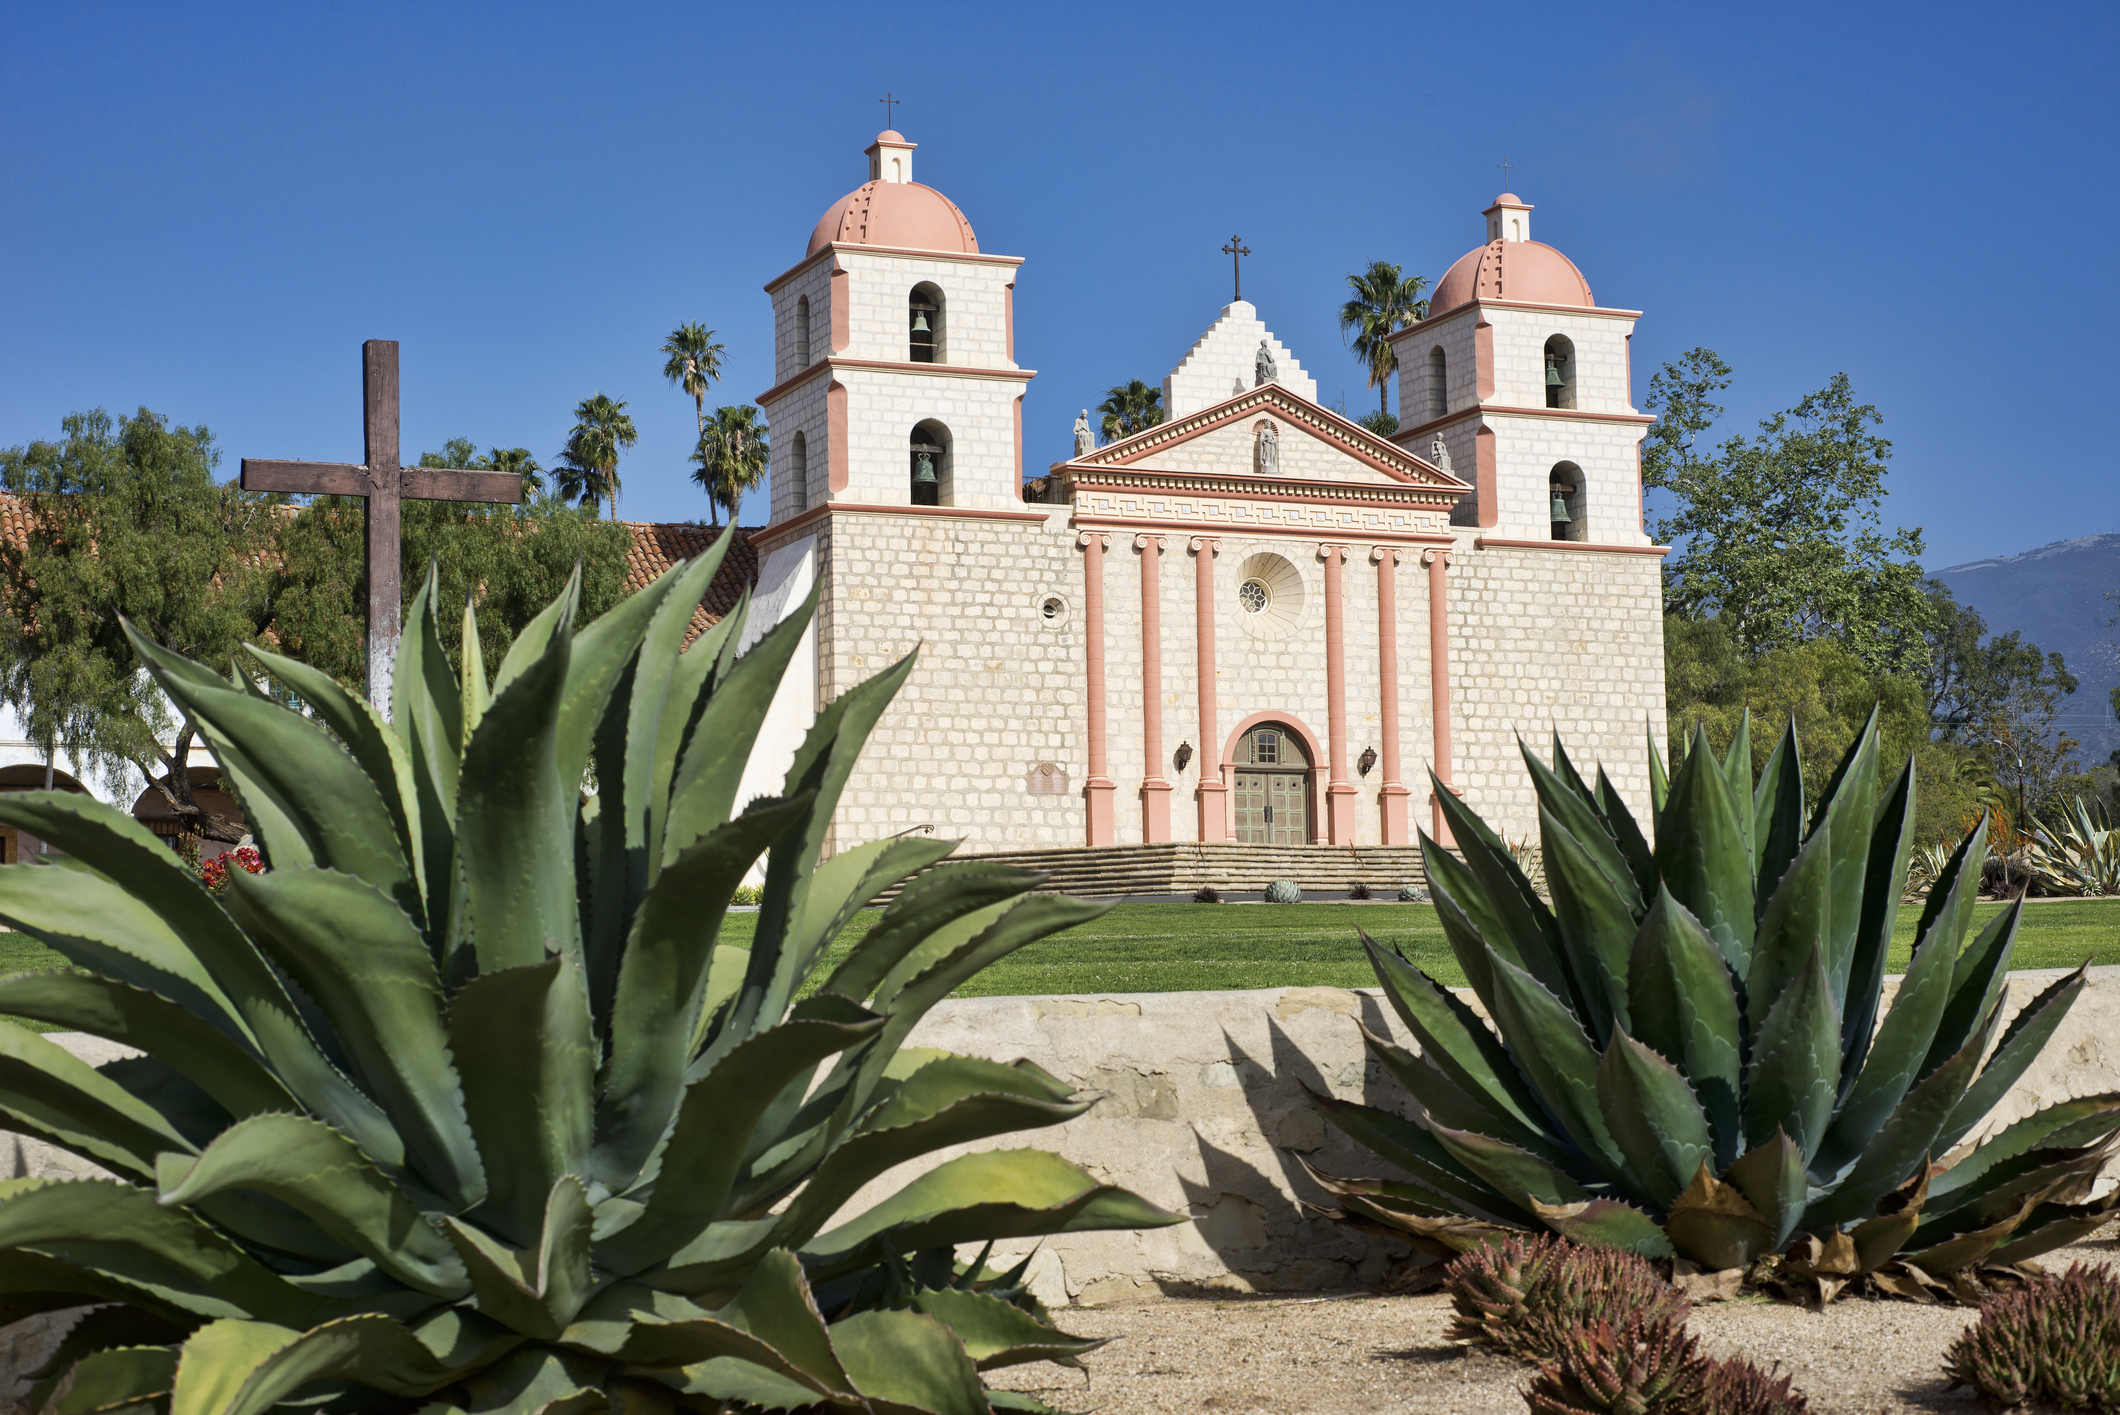 Santa Barbara Mission - ventura santa Barbara san Fernando Missions